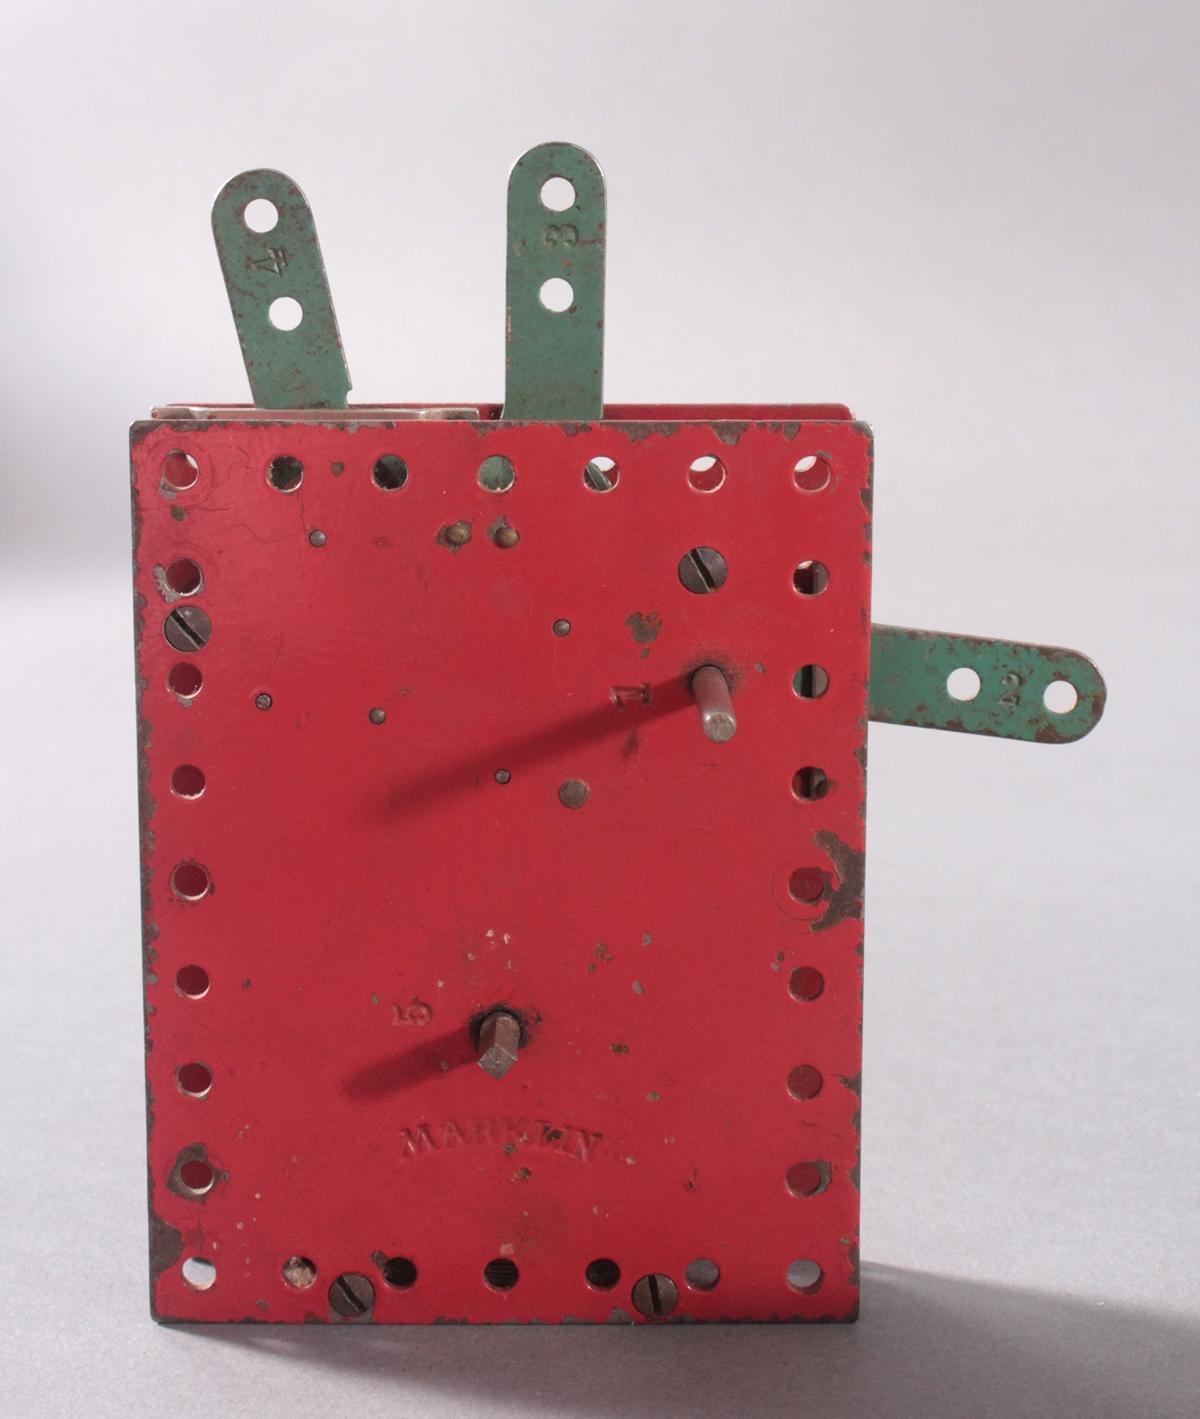 3x Märklin Uhrwerkmotor 201-2